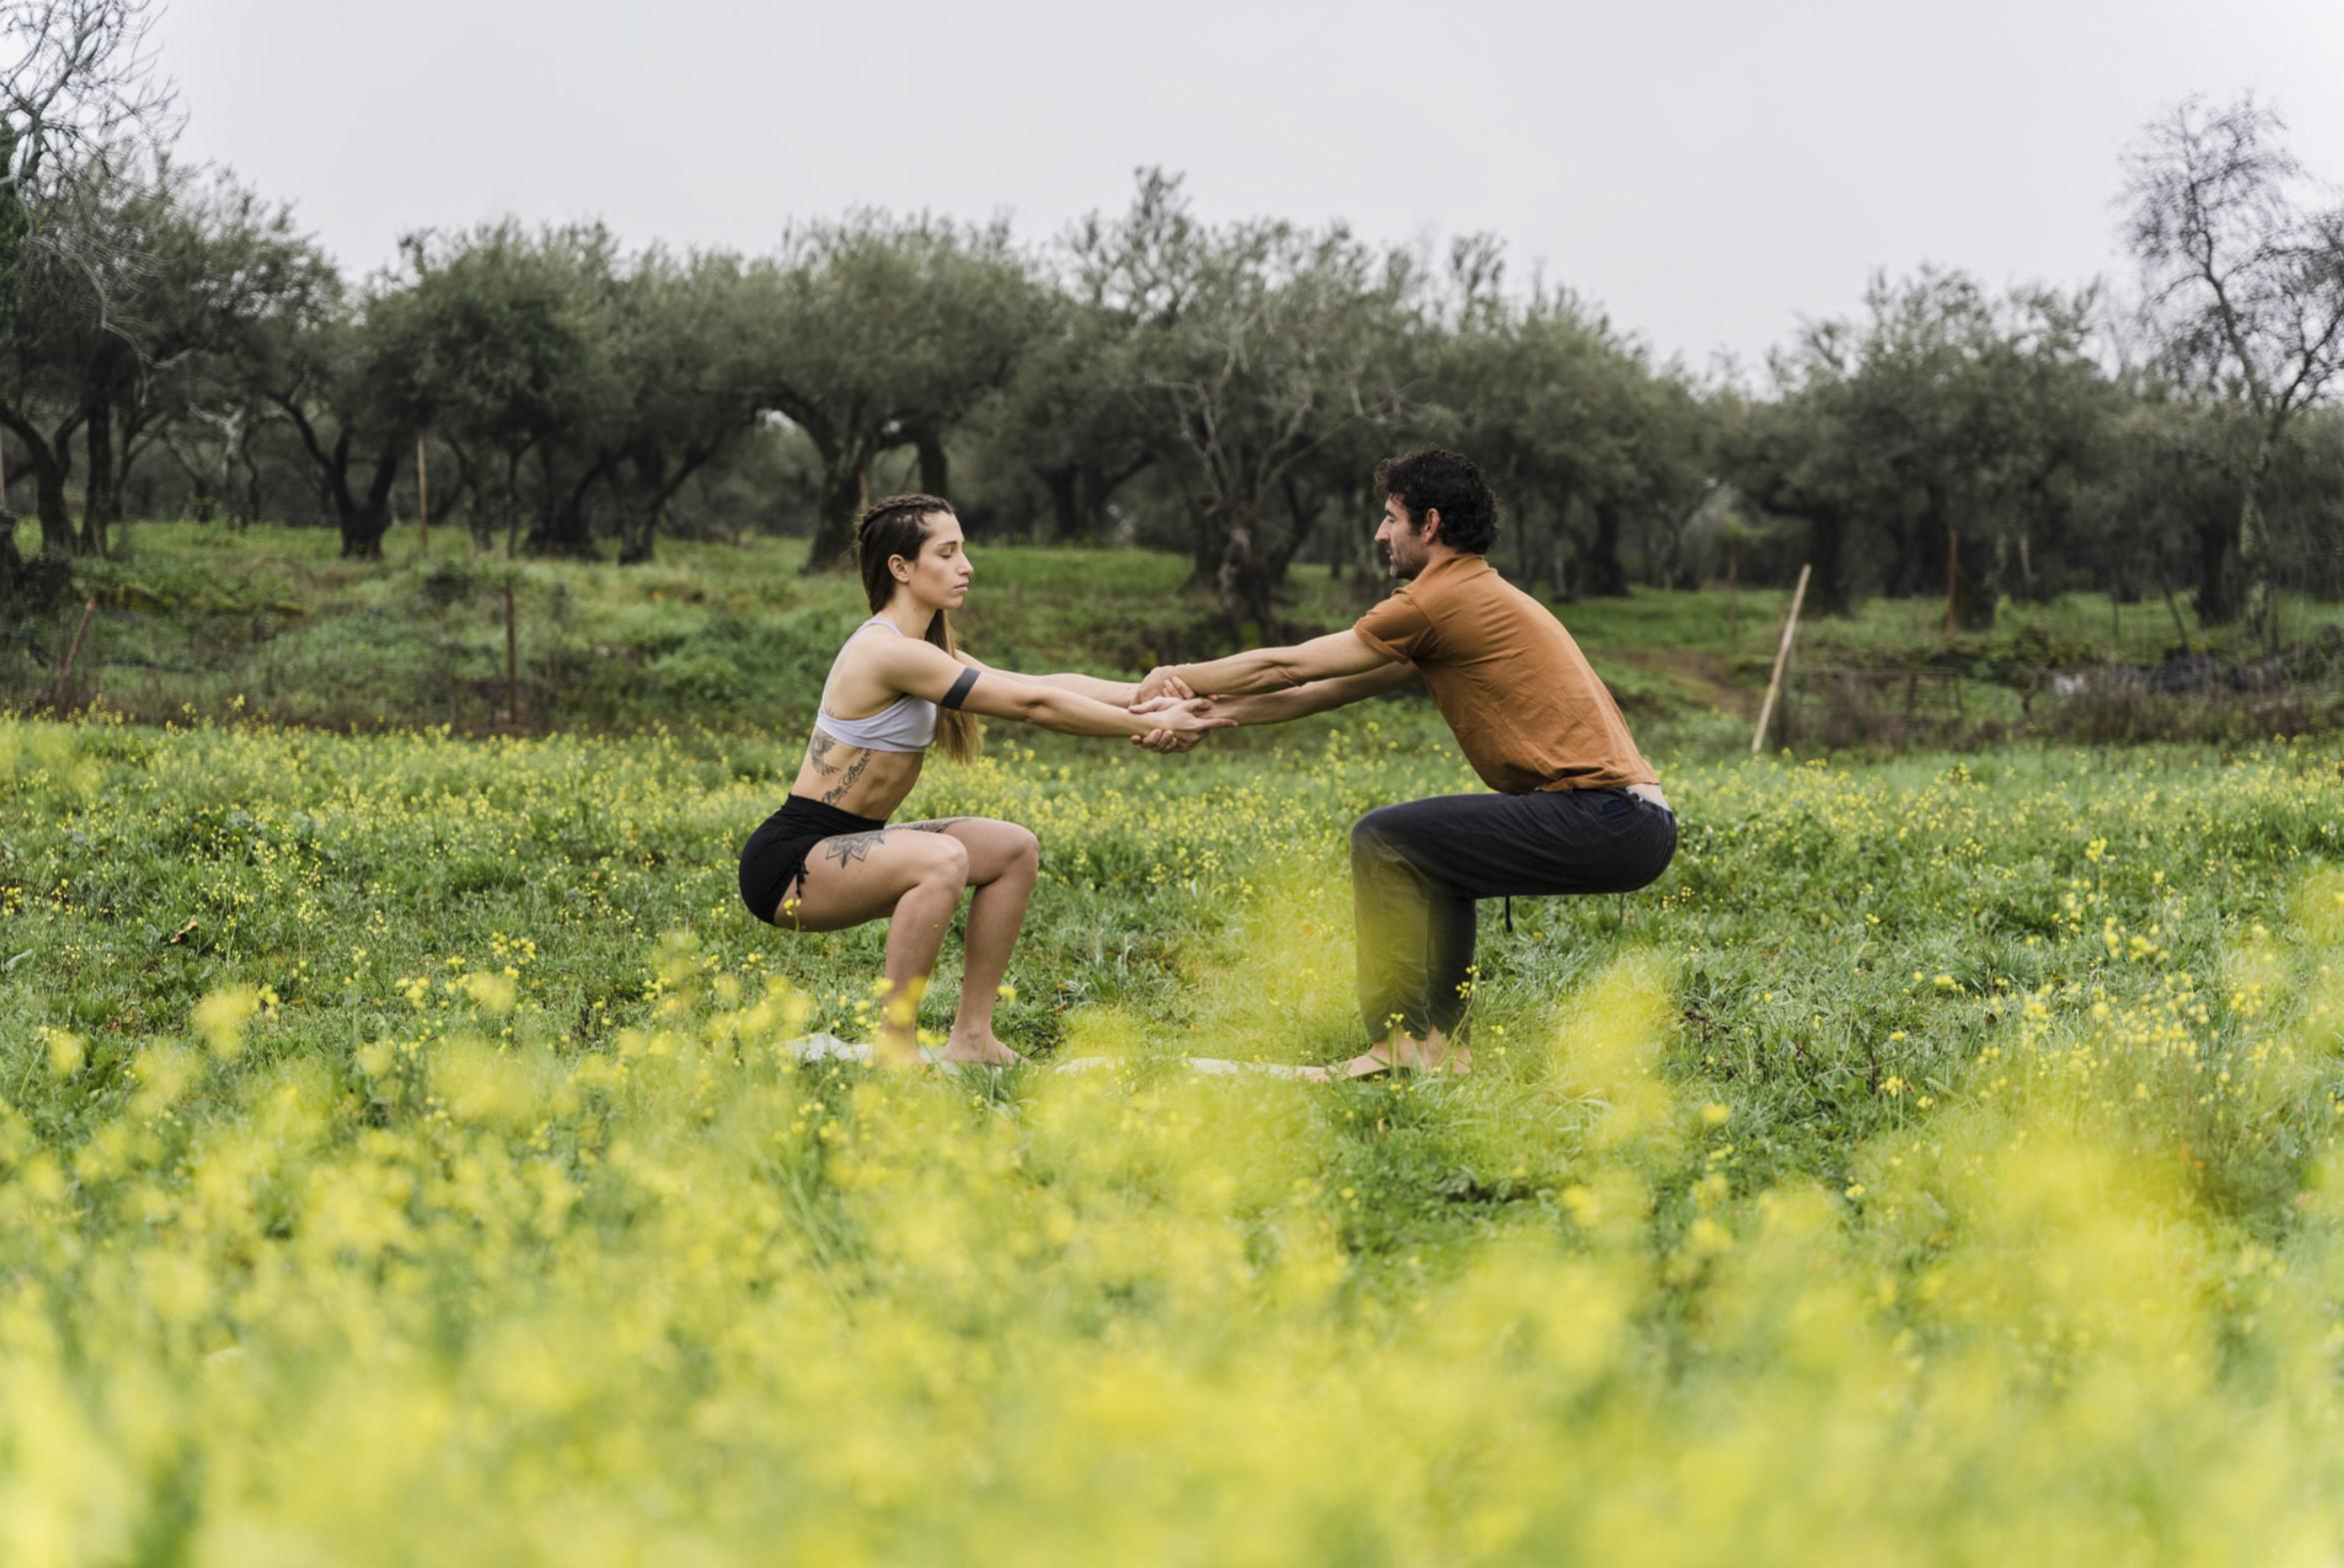 Pareja haciendo yoga en un retiro en España